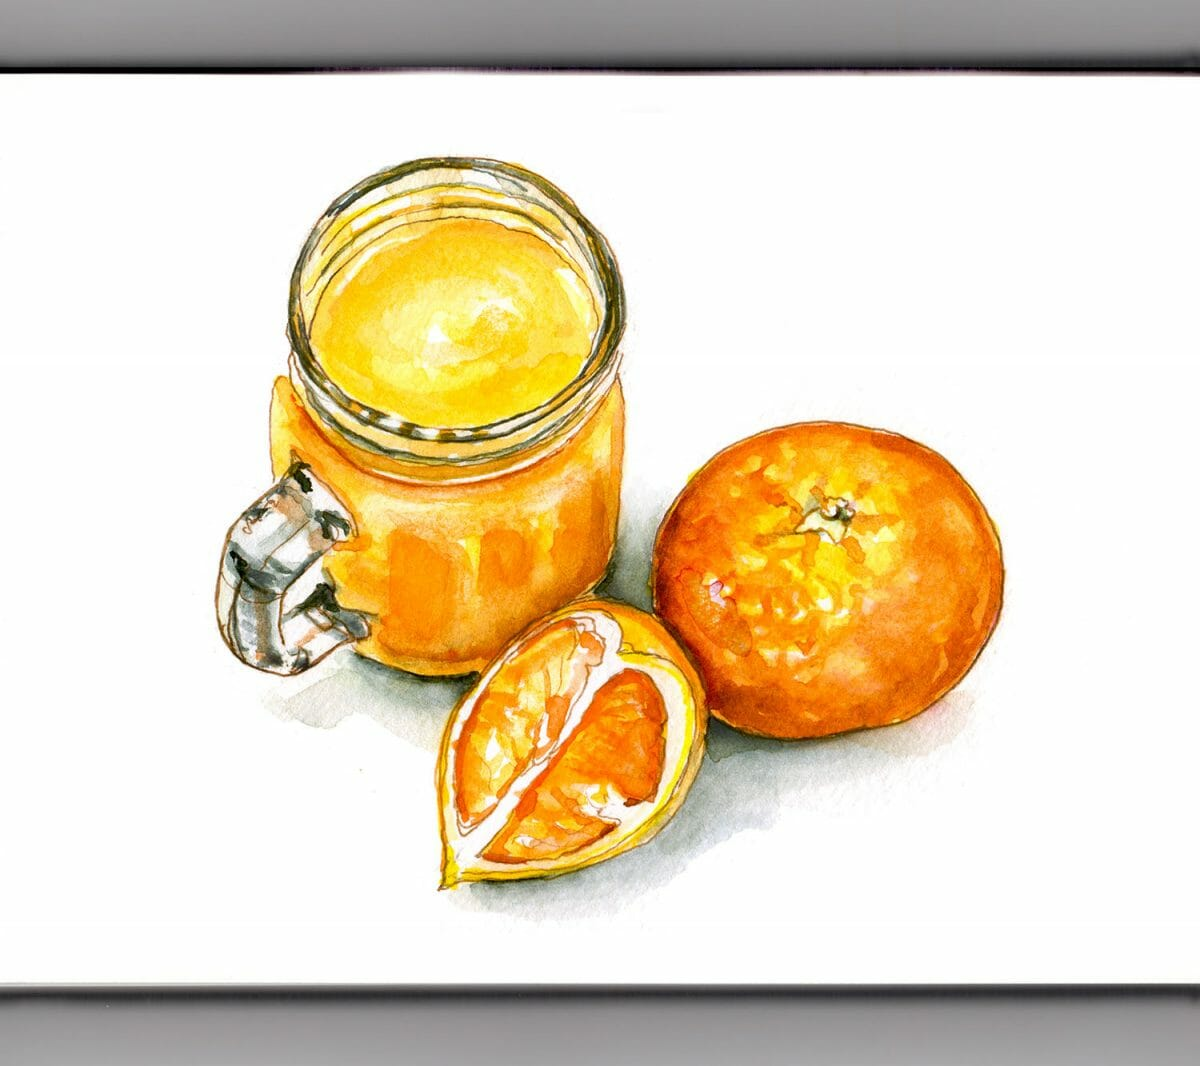 #WorldWatercolorGroup - Day 26 - Fresh Orange Juice - Doodlewash